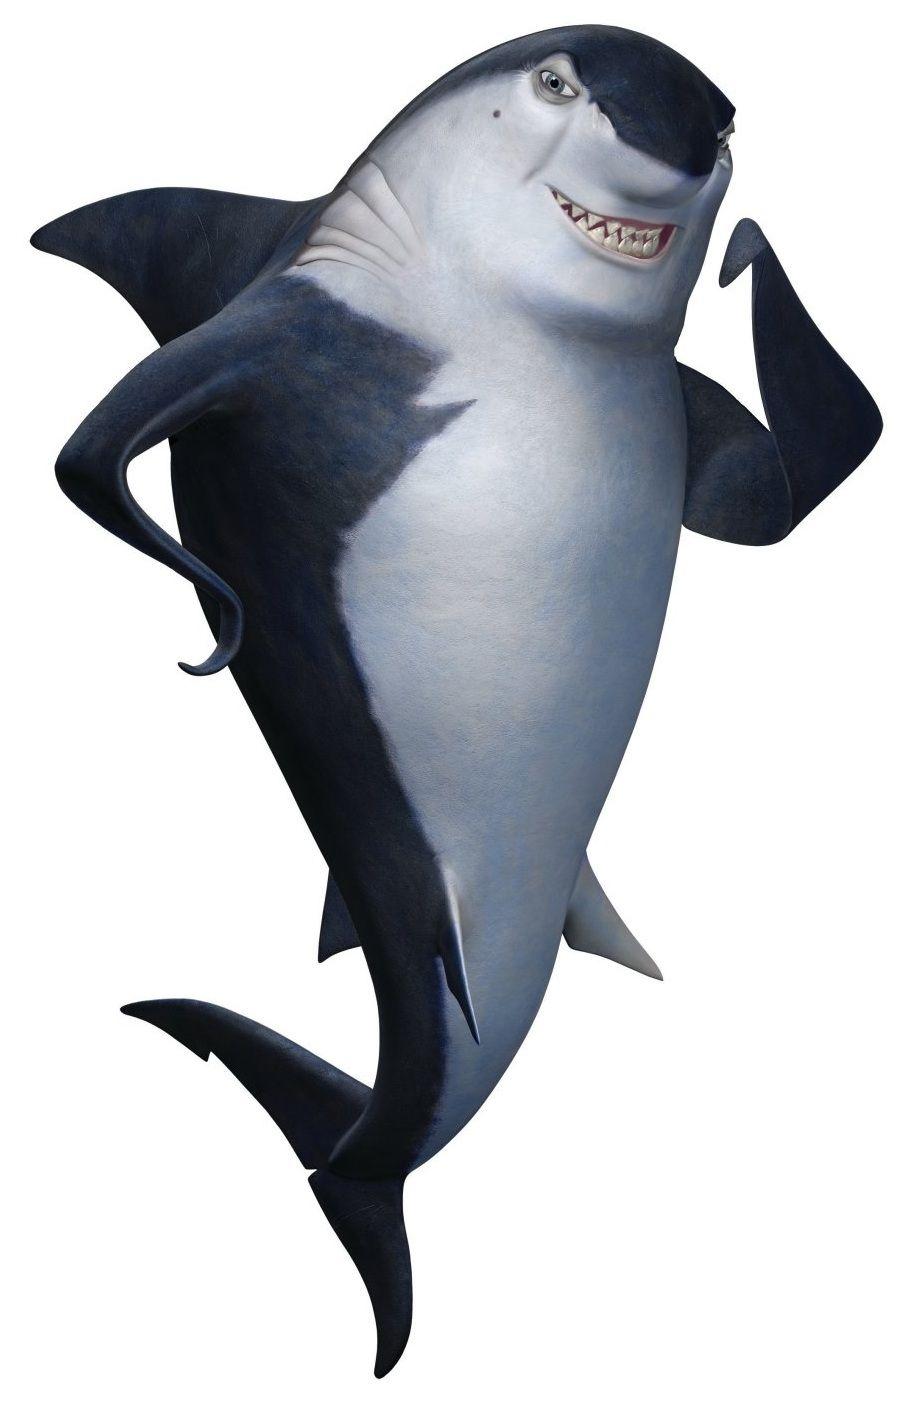 Gang de requin personnages dessins animes pinterest gang de requins requin et dessin anim - Requin dessin ...